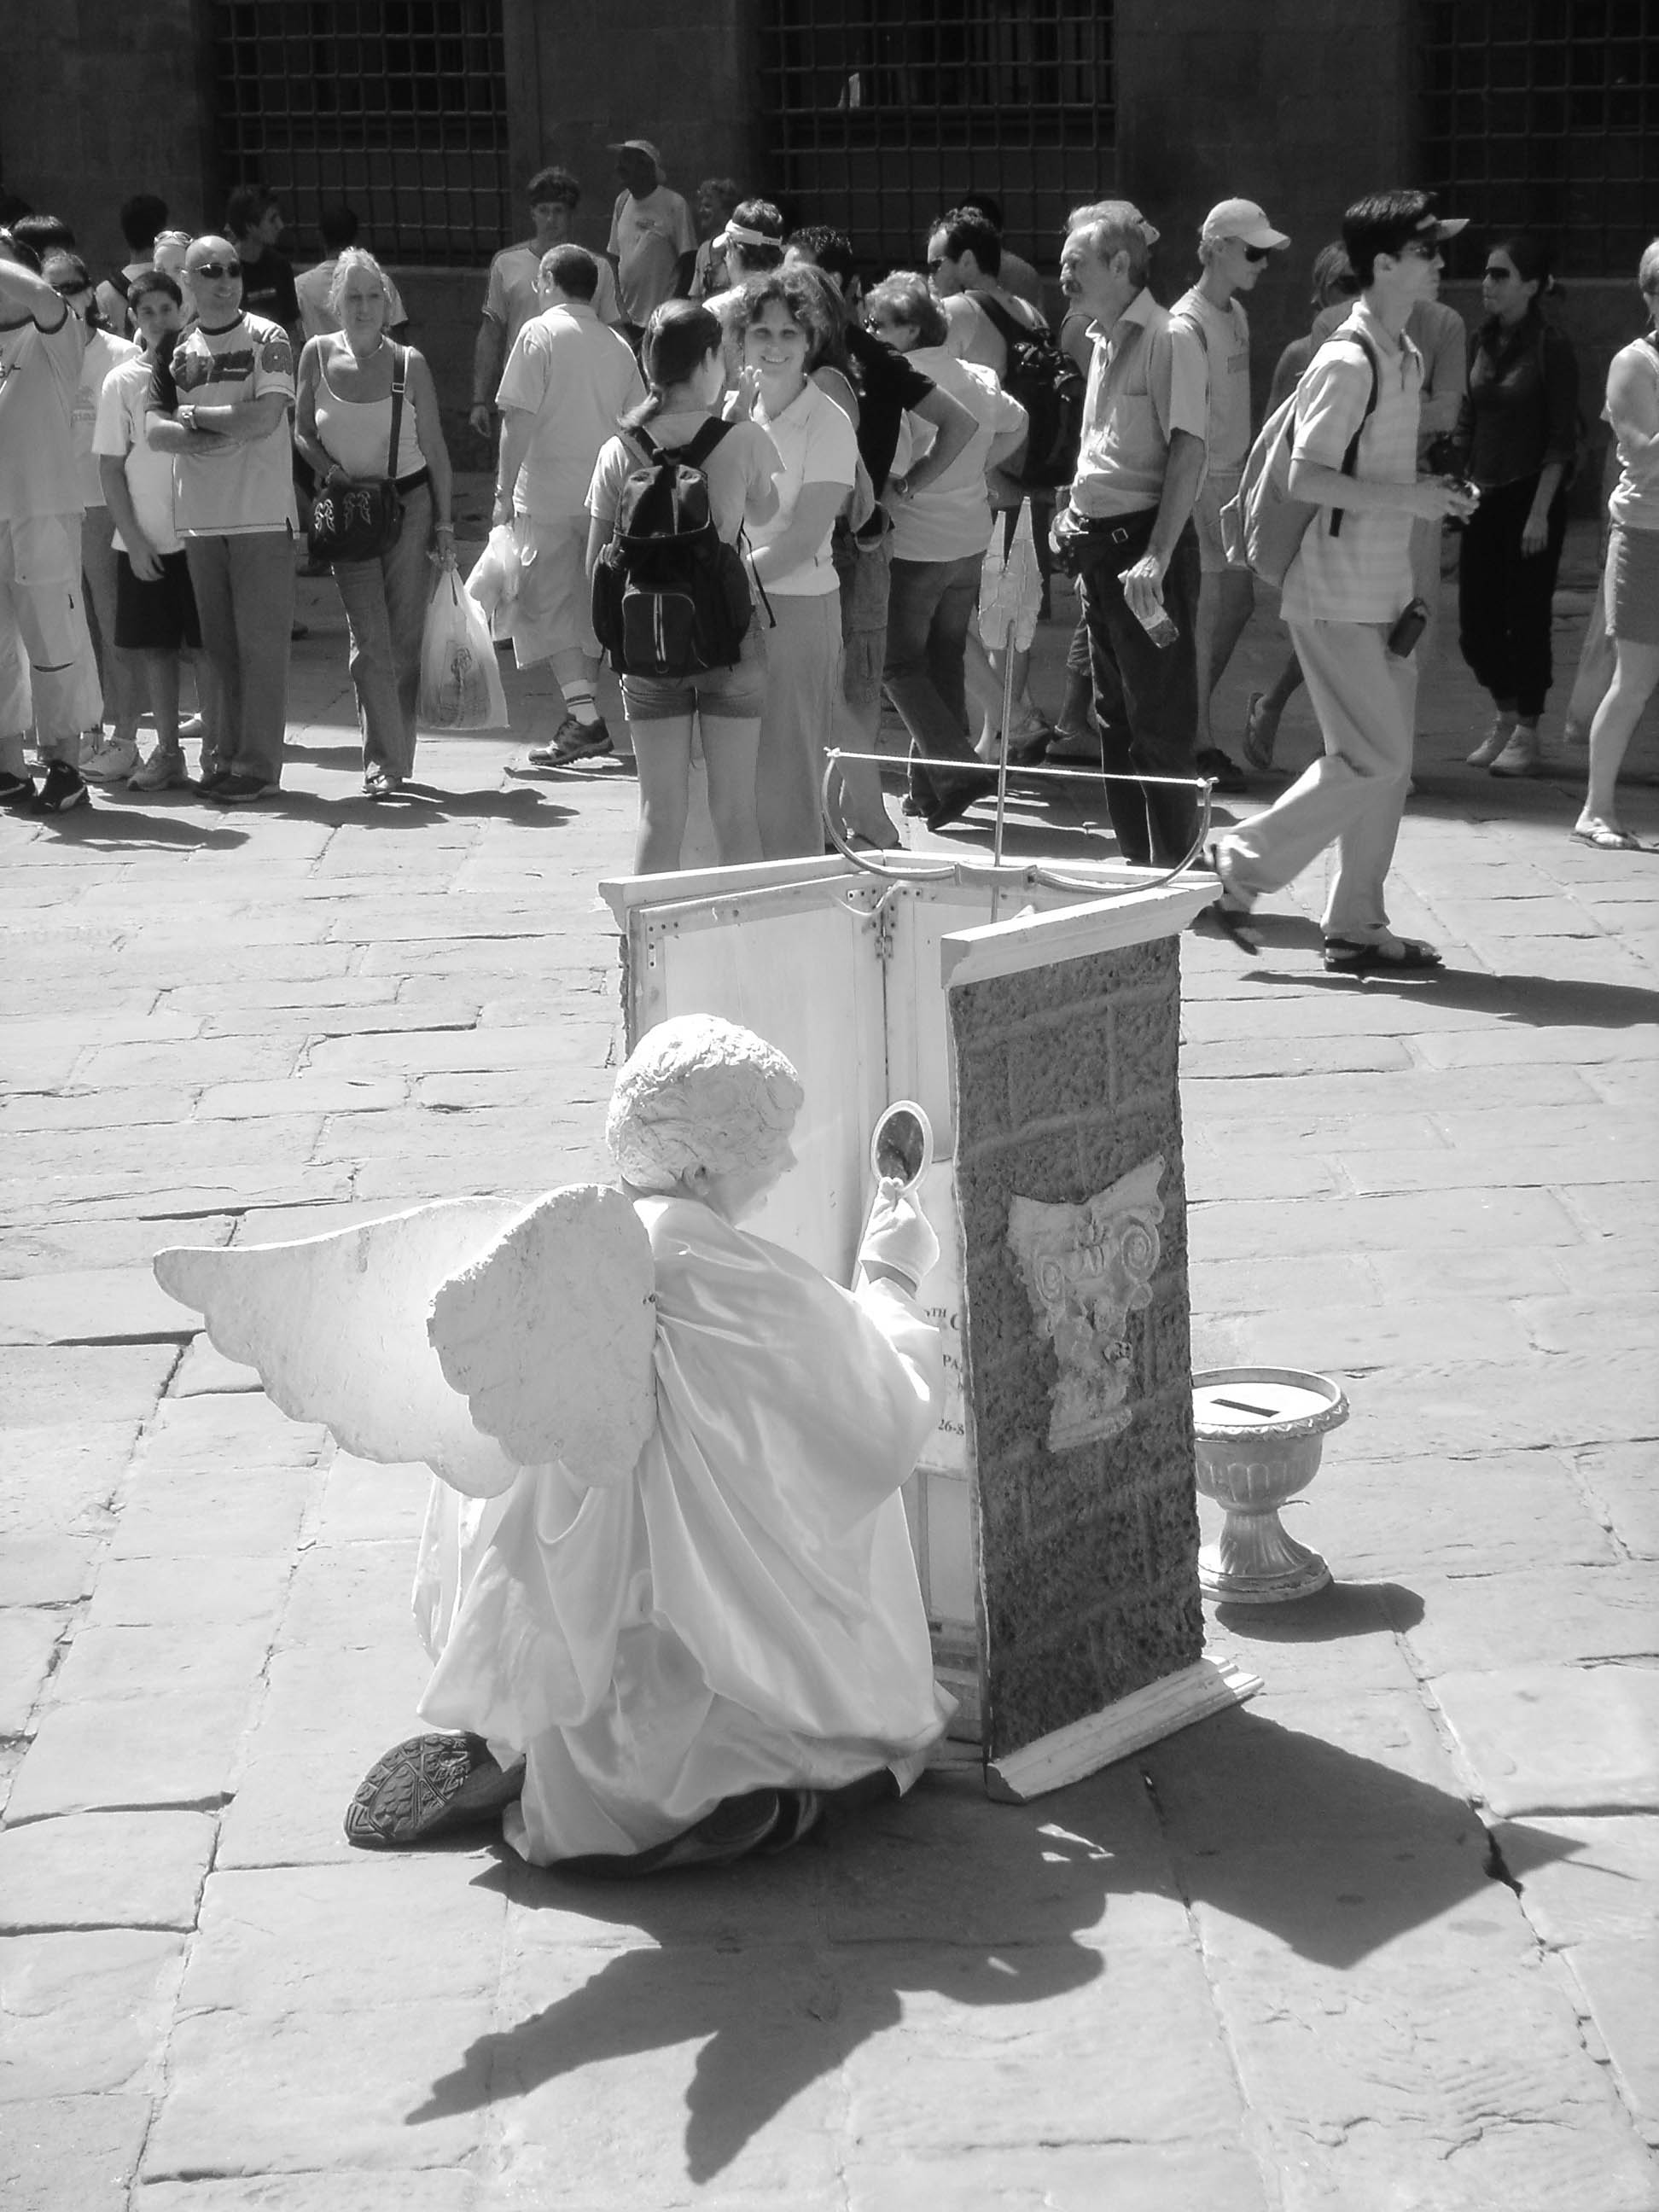 PHOTOGRAPHIER FLORENCE, L'ANGE ET SON MAQUILLAGE